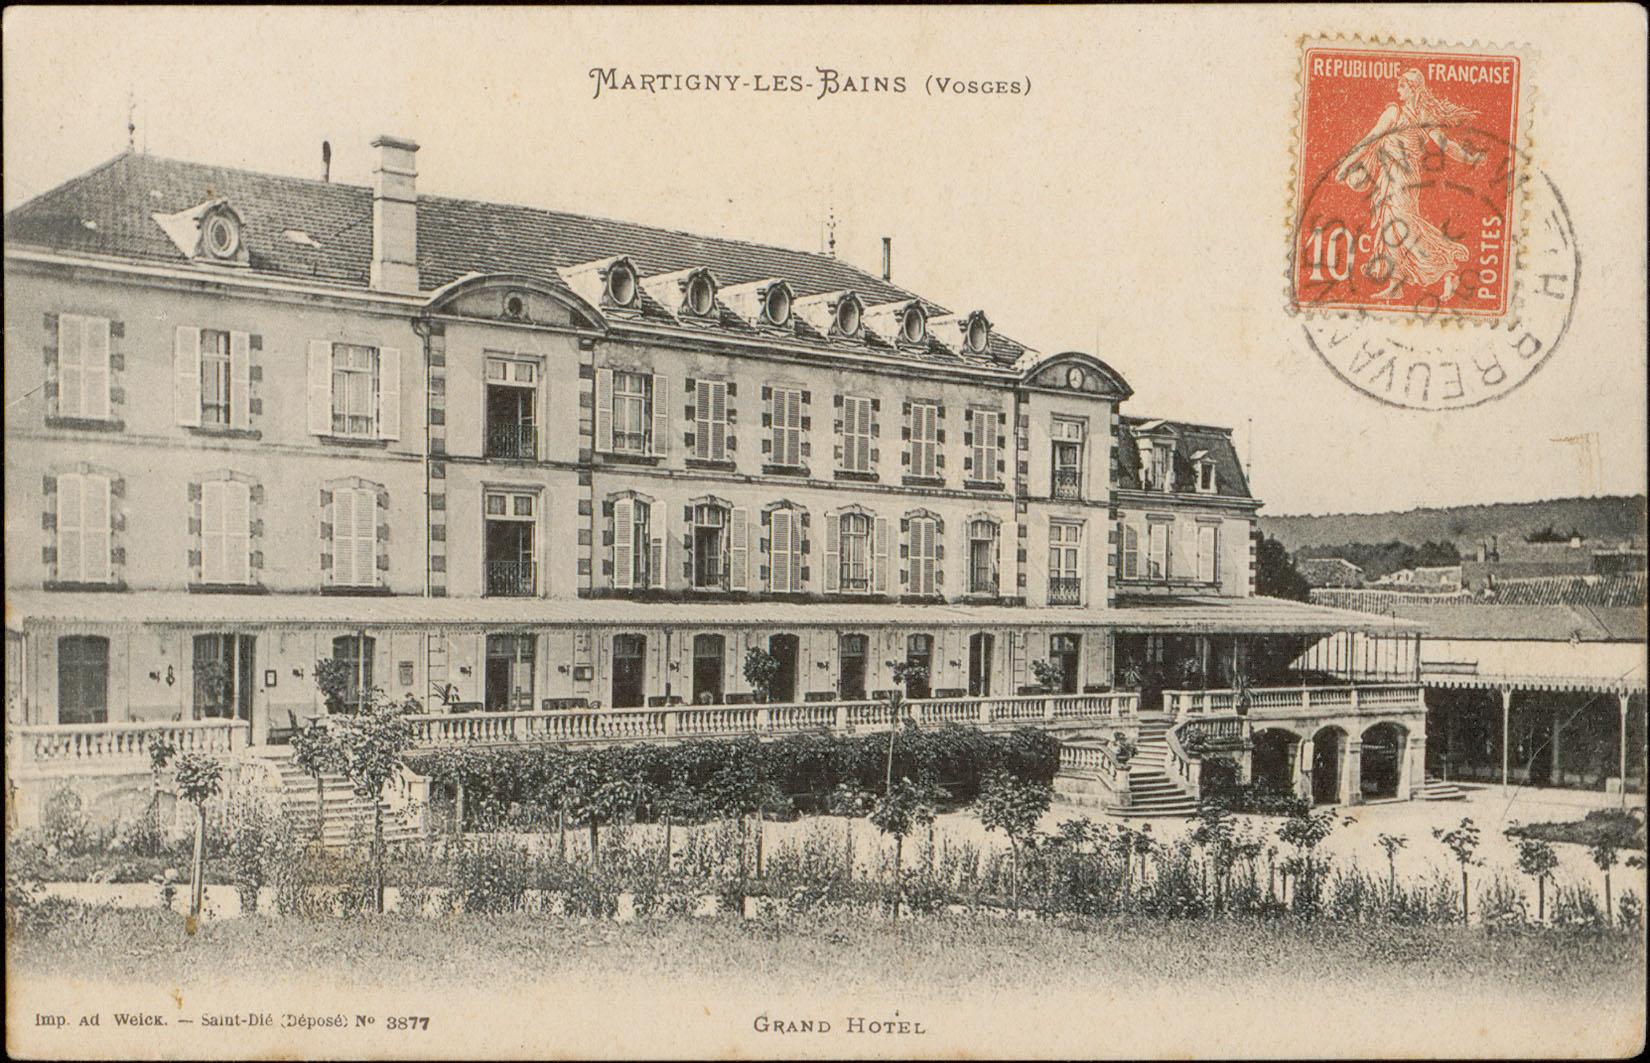 Contenu du Martigny-les-Bains (Vosges), Grand Hôtel